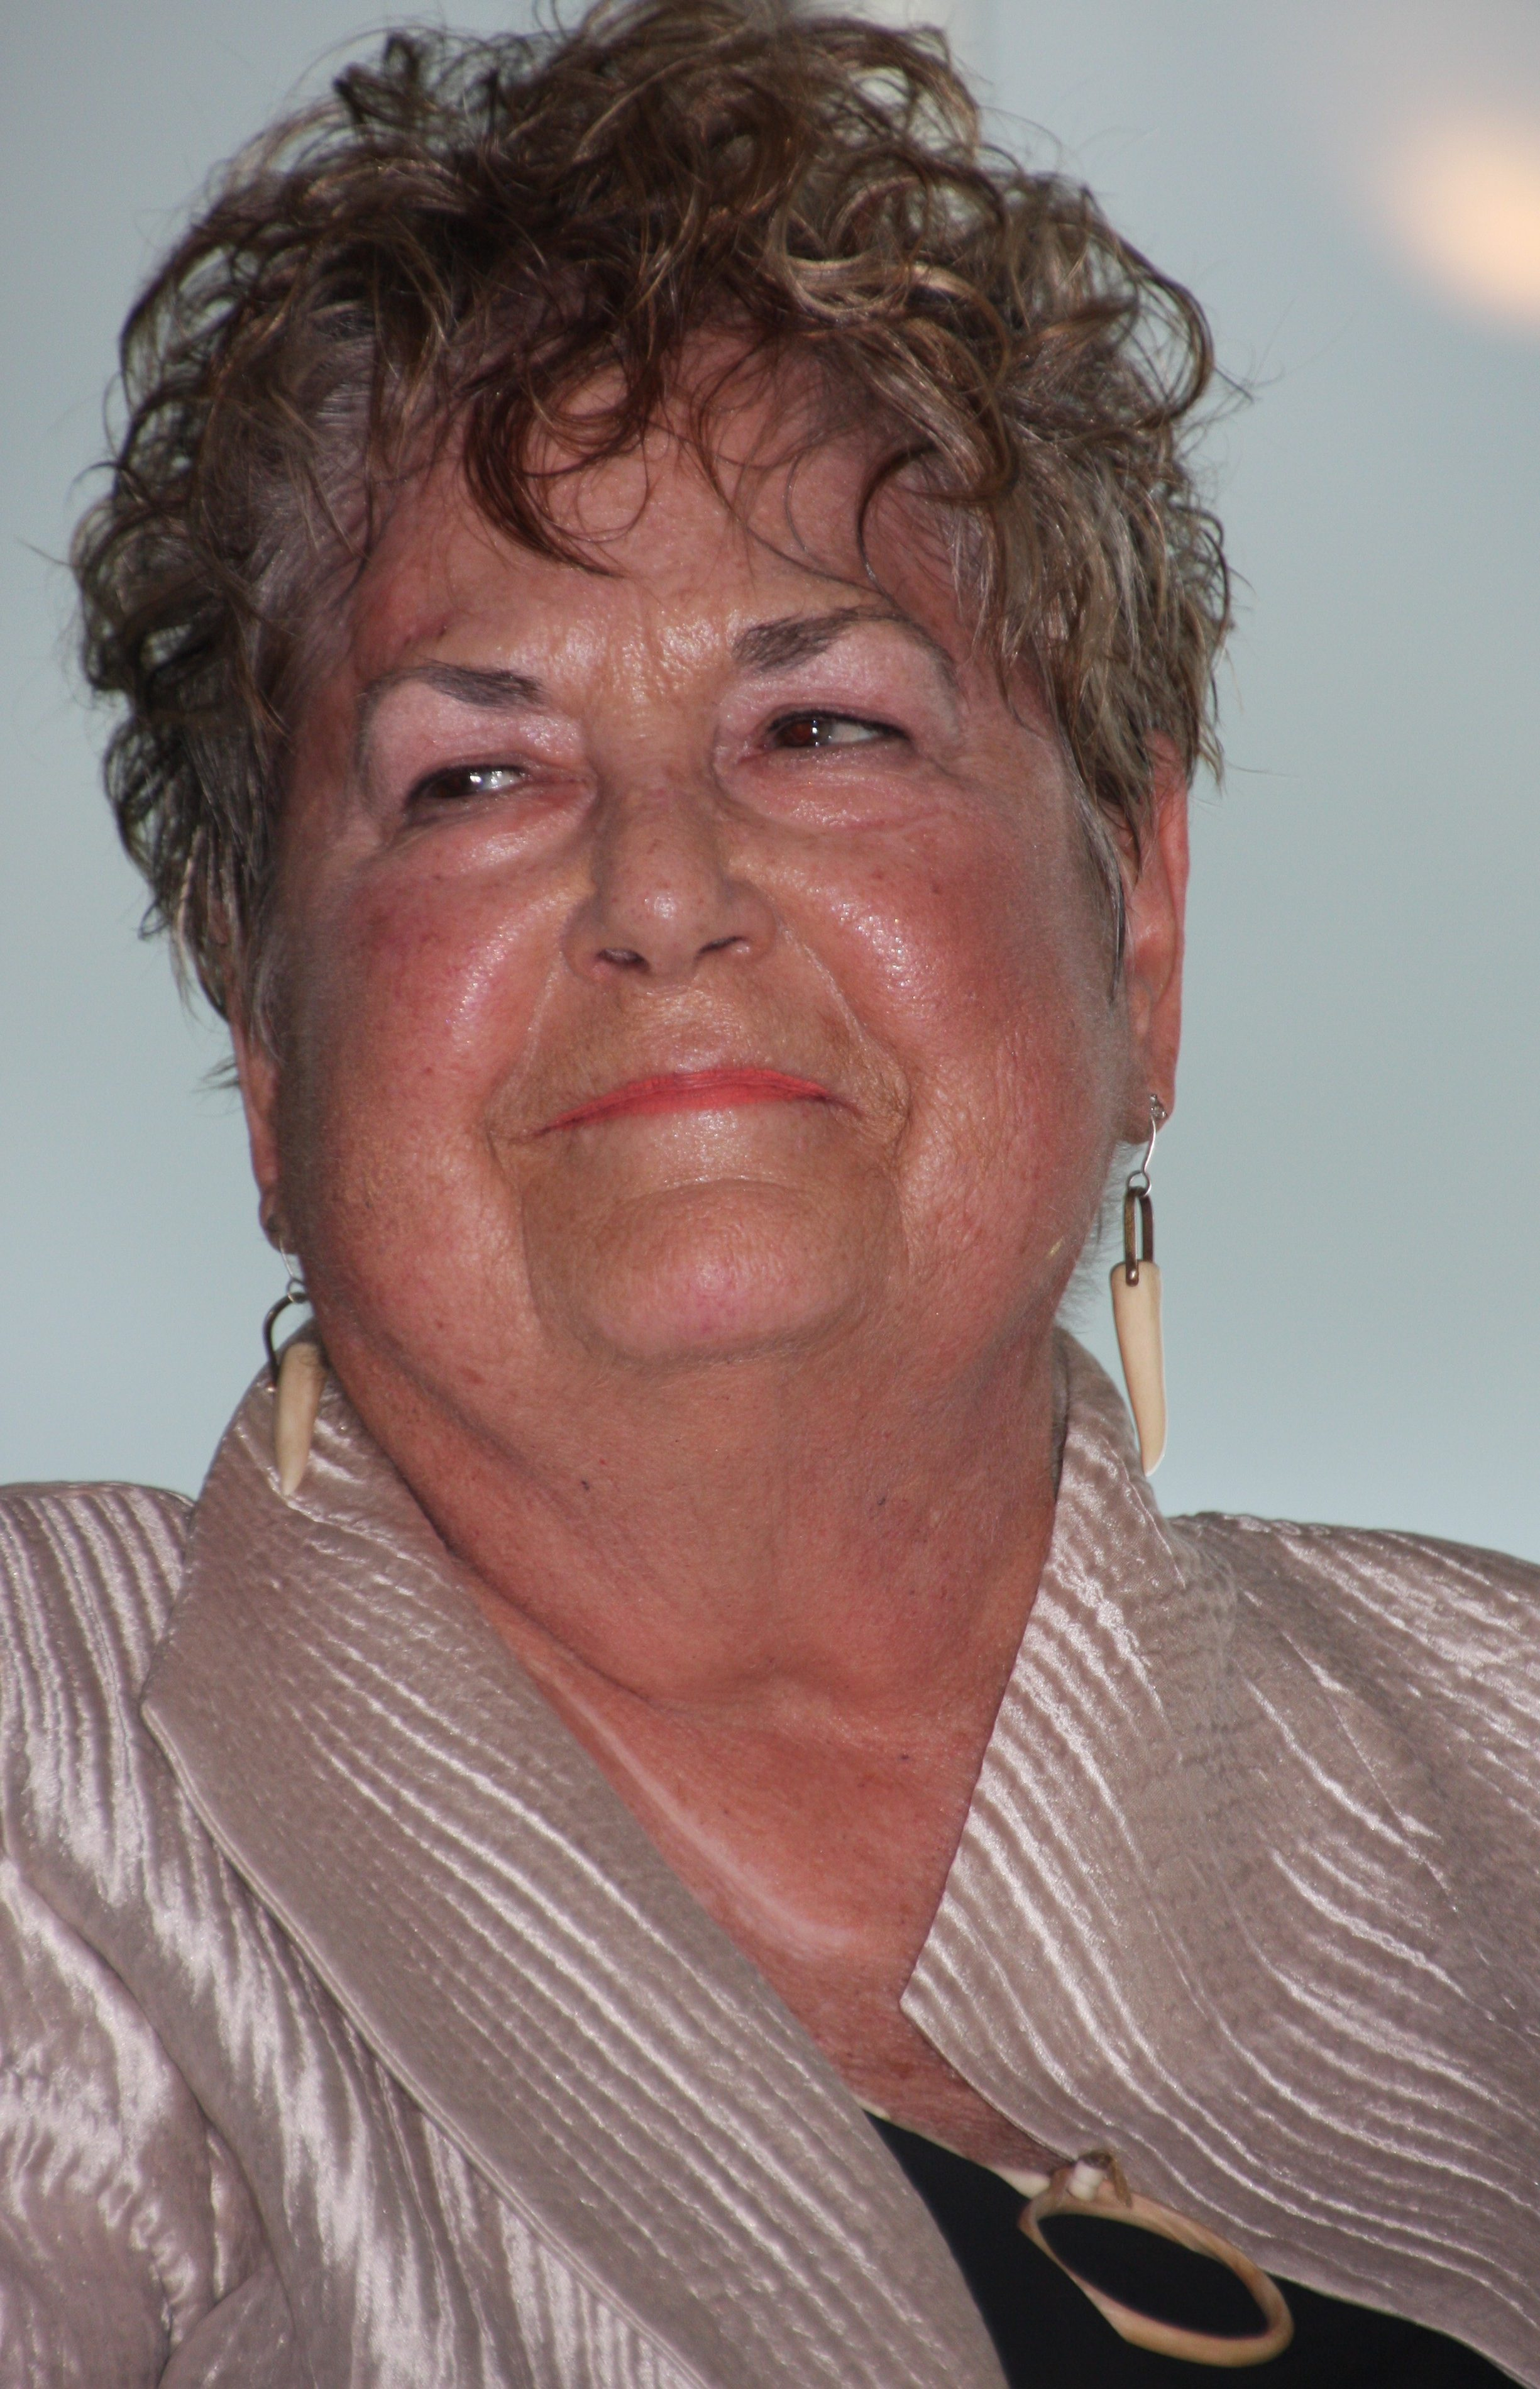 Judy Onofrio, Foto Jonathunder, portret, oorsieraden